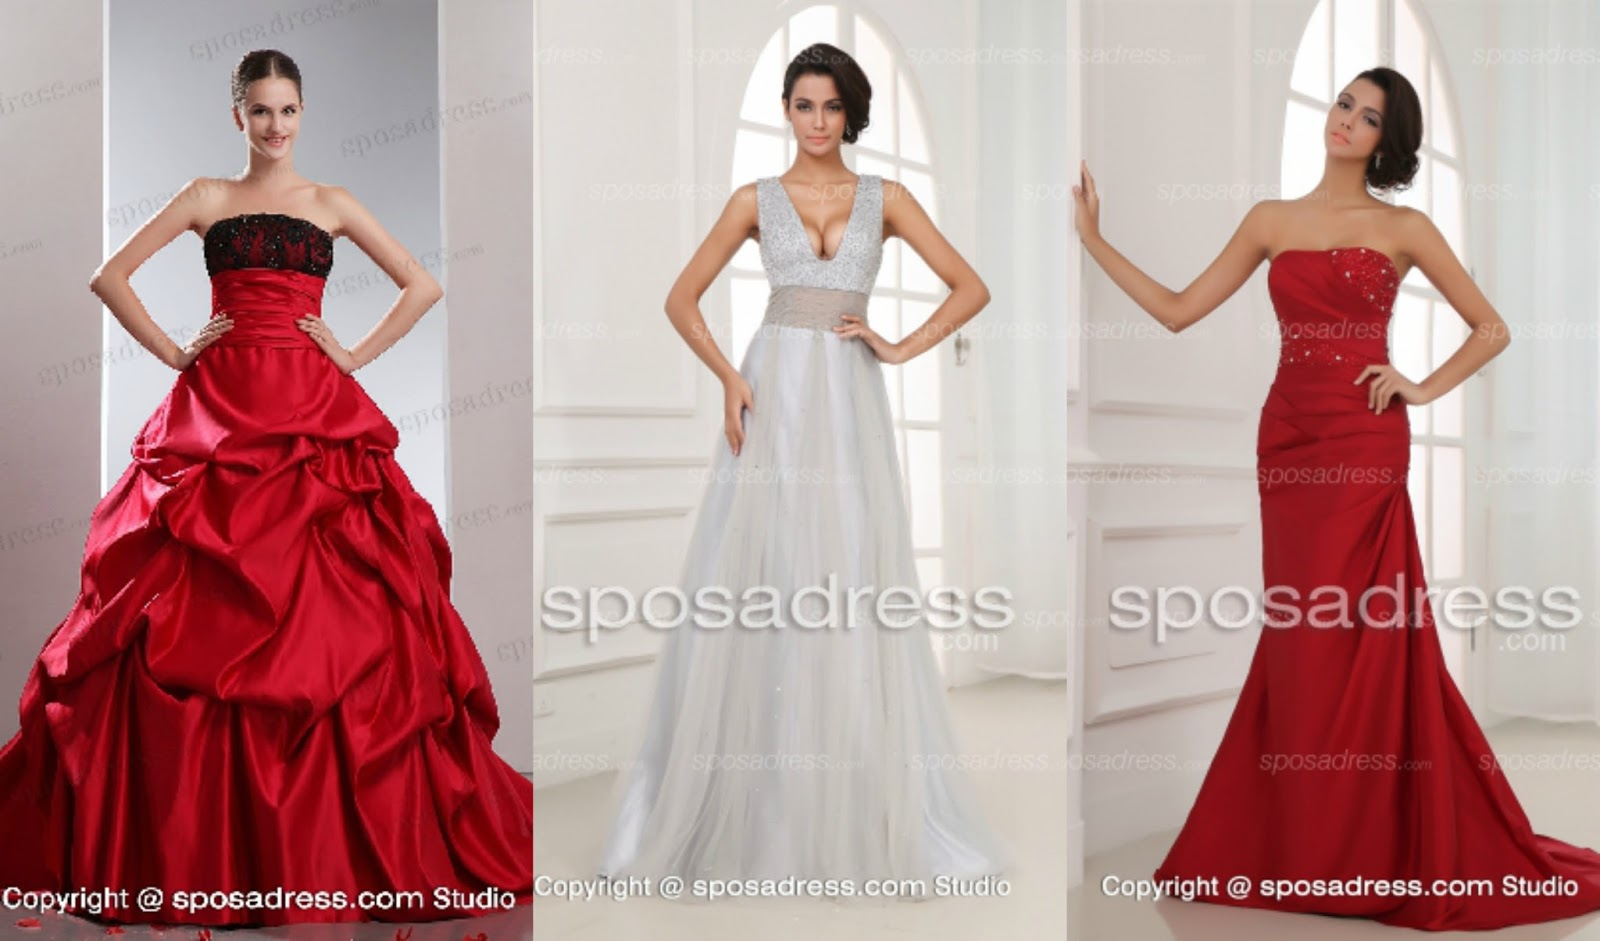 Christmas Themed Wedding Dress Inspiration - Fashion Fairytale